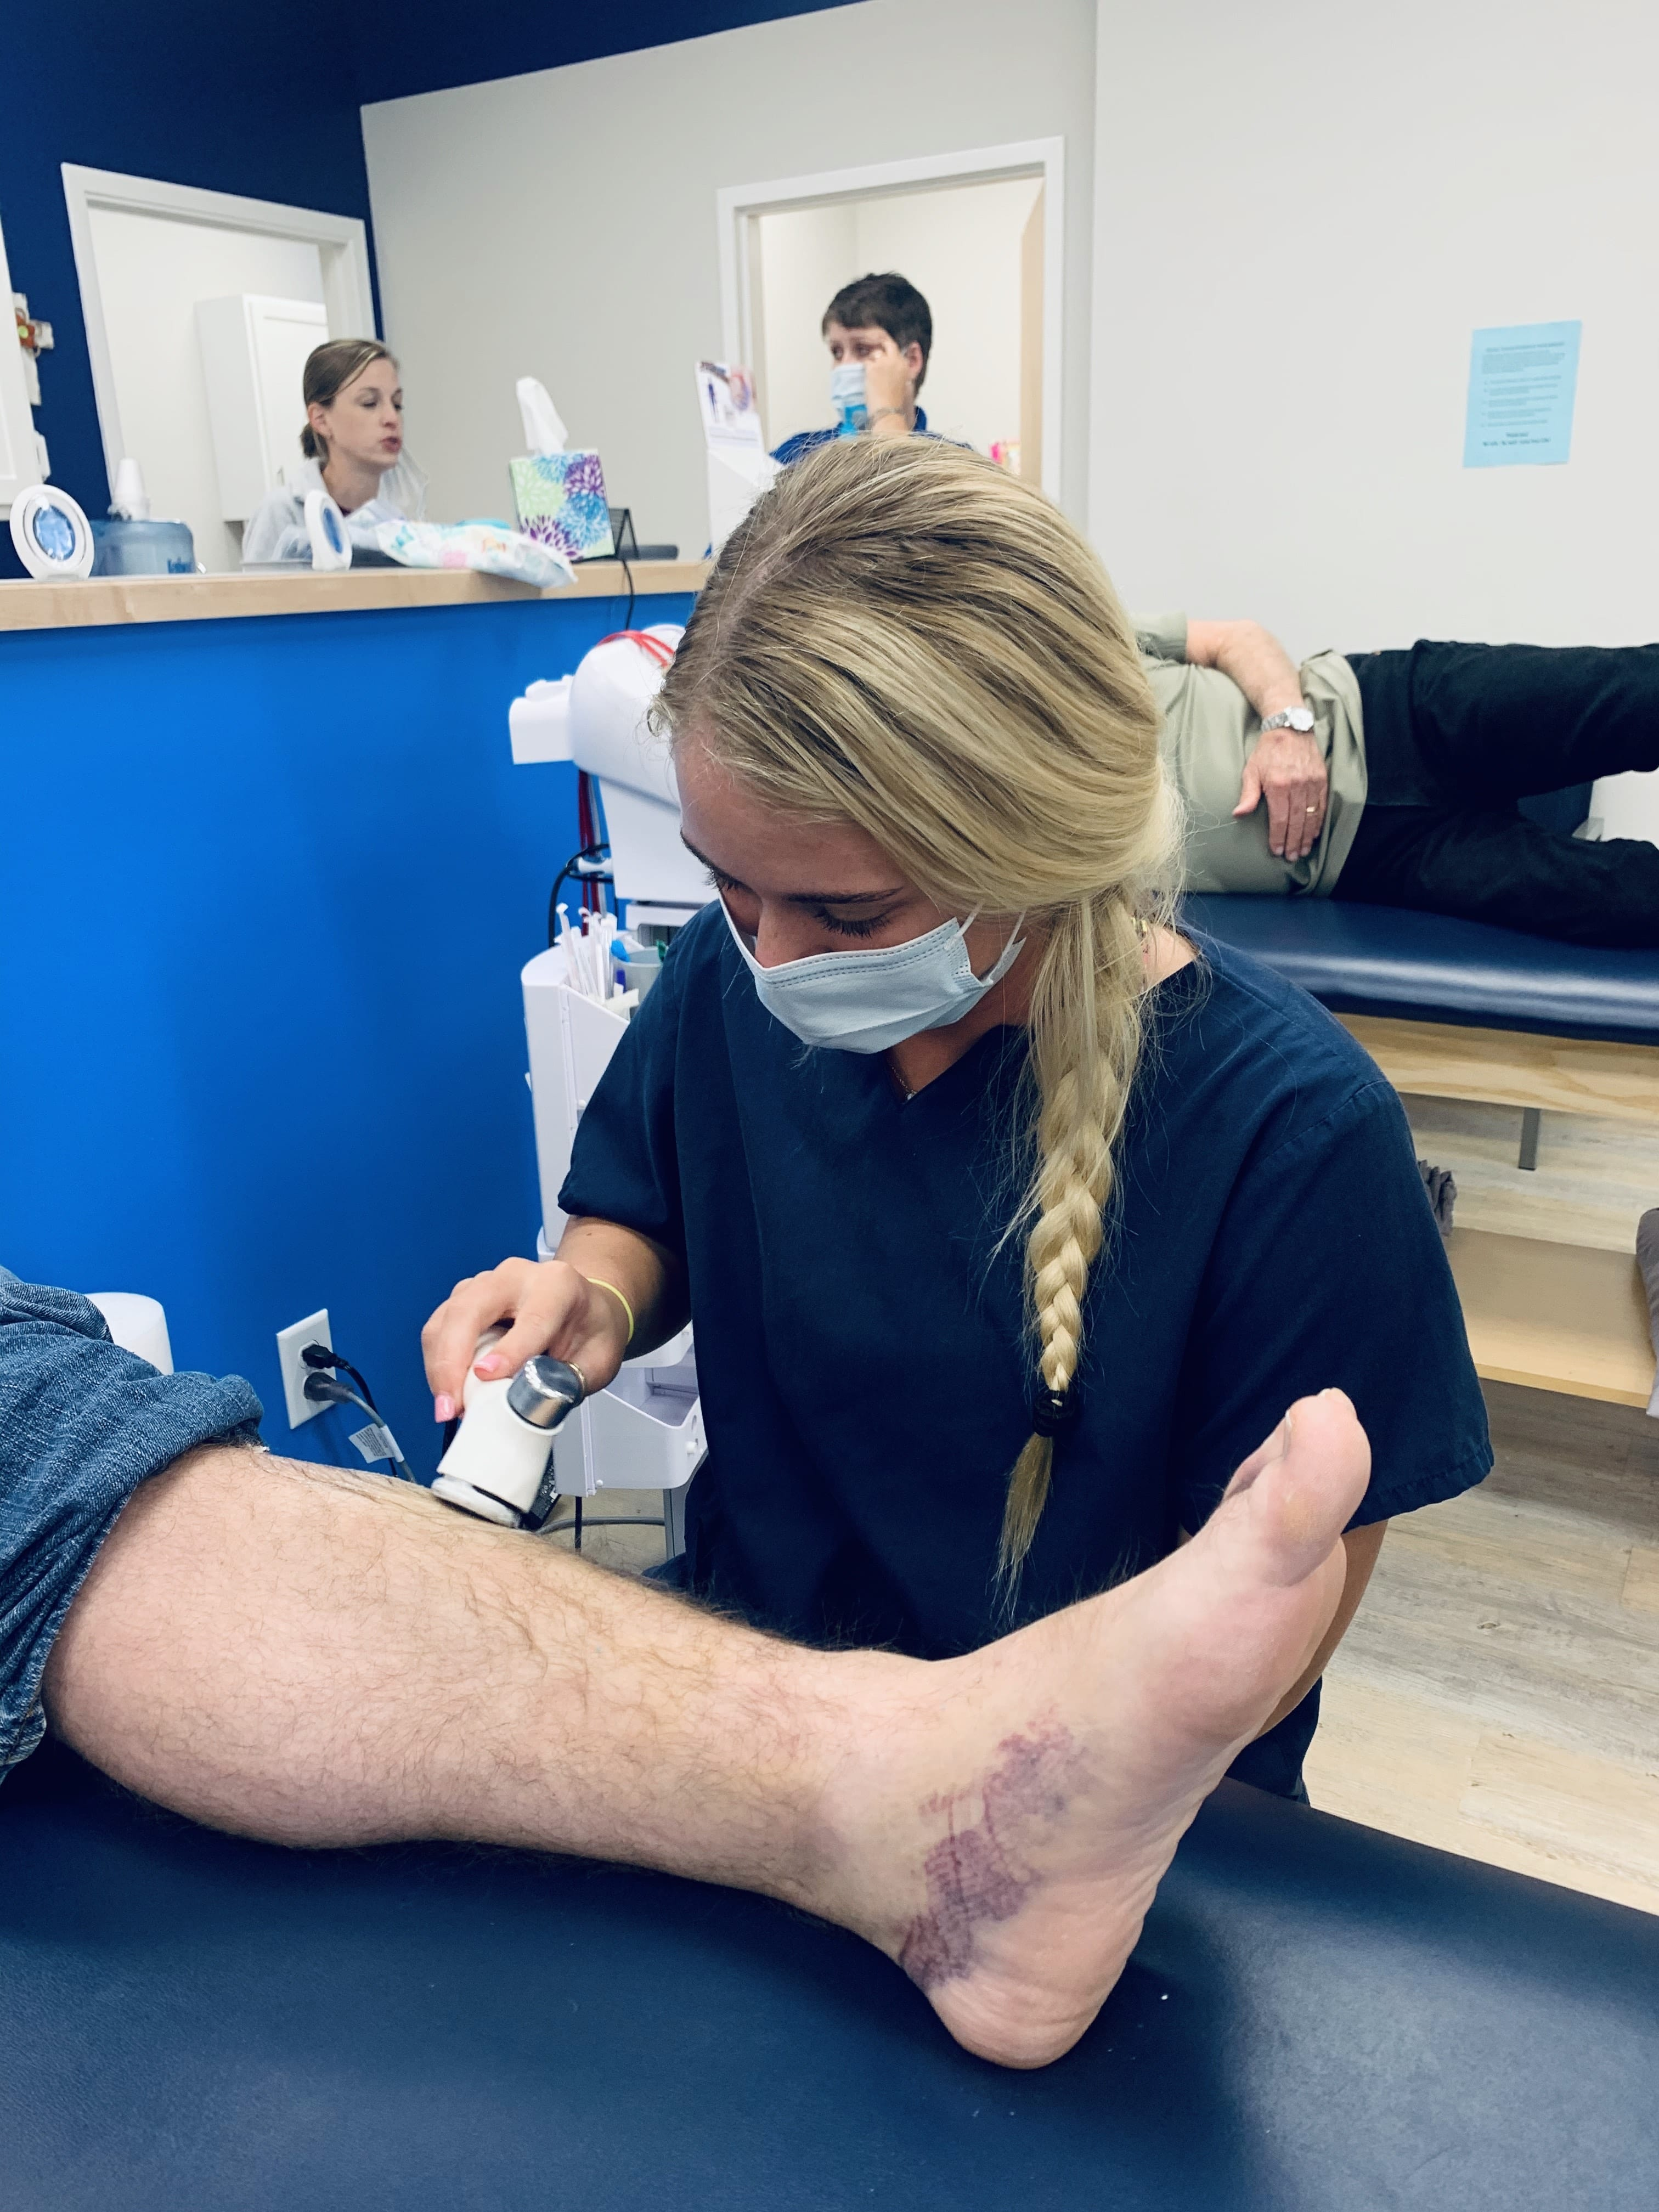 HHP student Aubrey Dillon performs an ultrasound on a patient's leg.